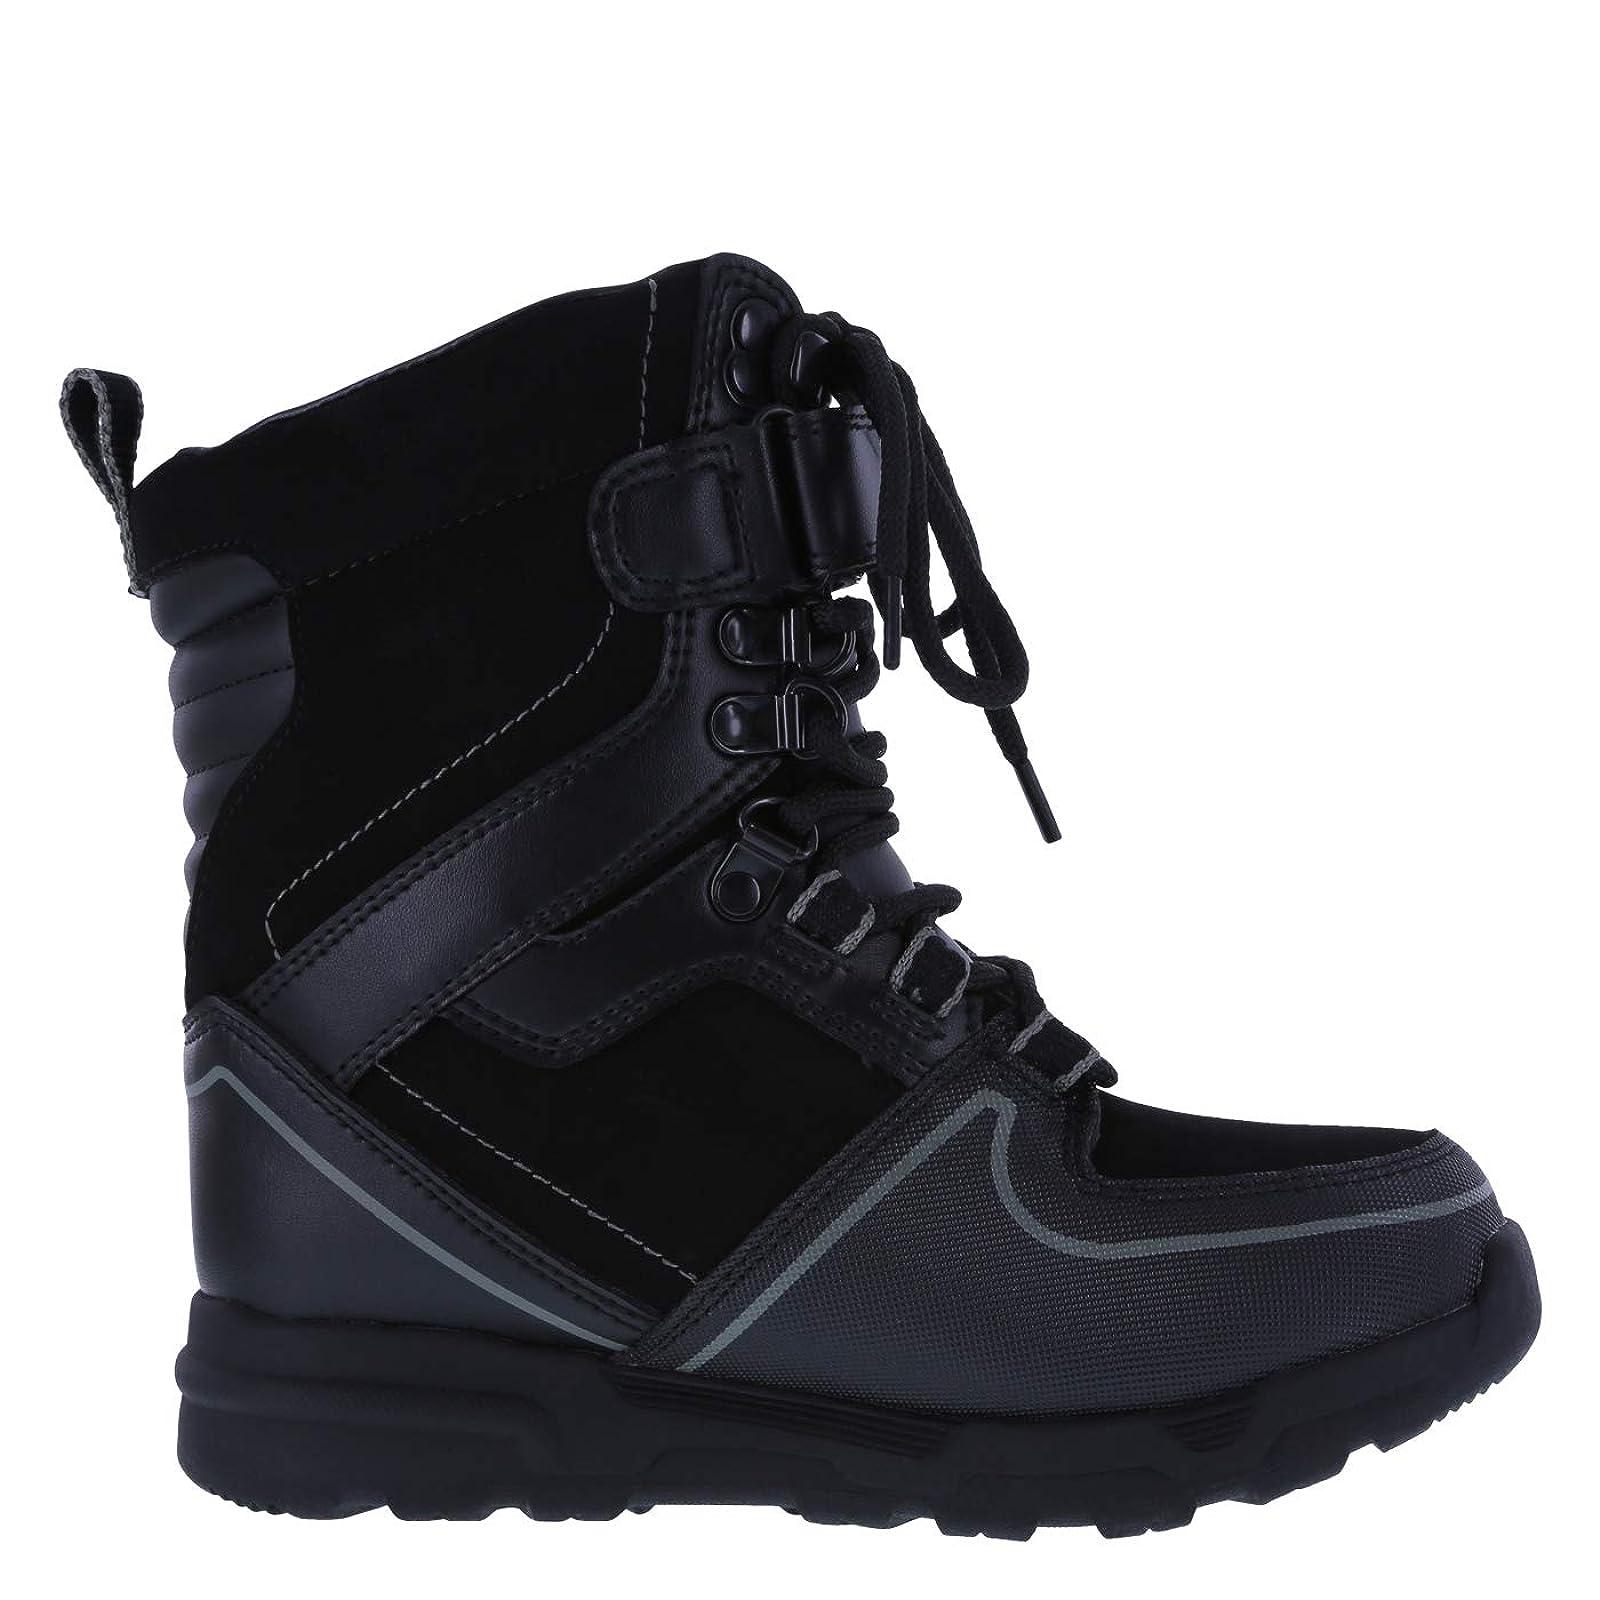 Rugged Outback Black Boys' Mo -30 Snowboard 176987060 - 1